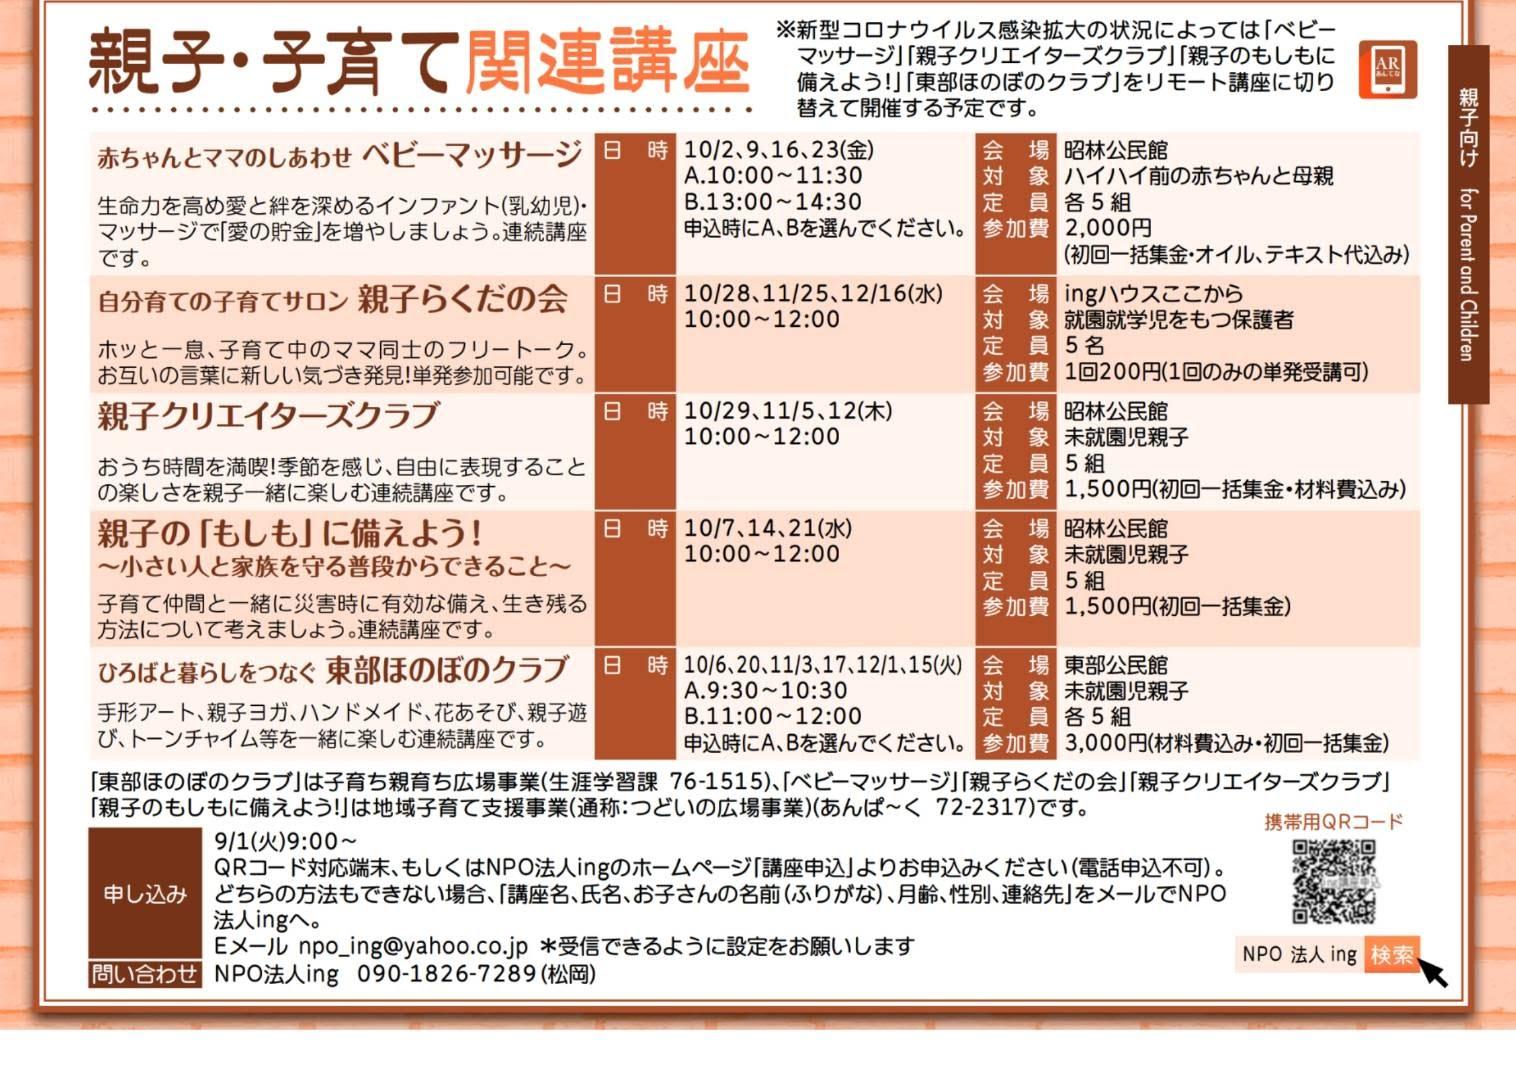 https://www.city.anjo.aichi.jp/manabu/shogaigakushu/documents/anntena2020akigousassibannpart6.pdf